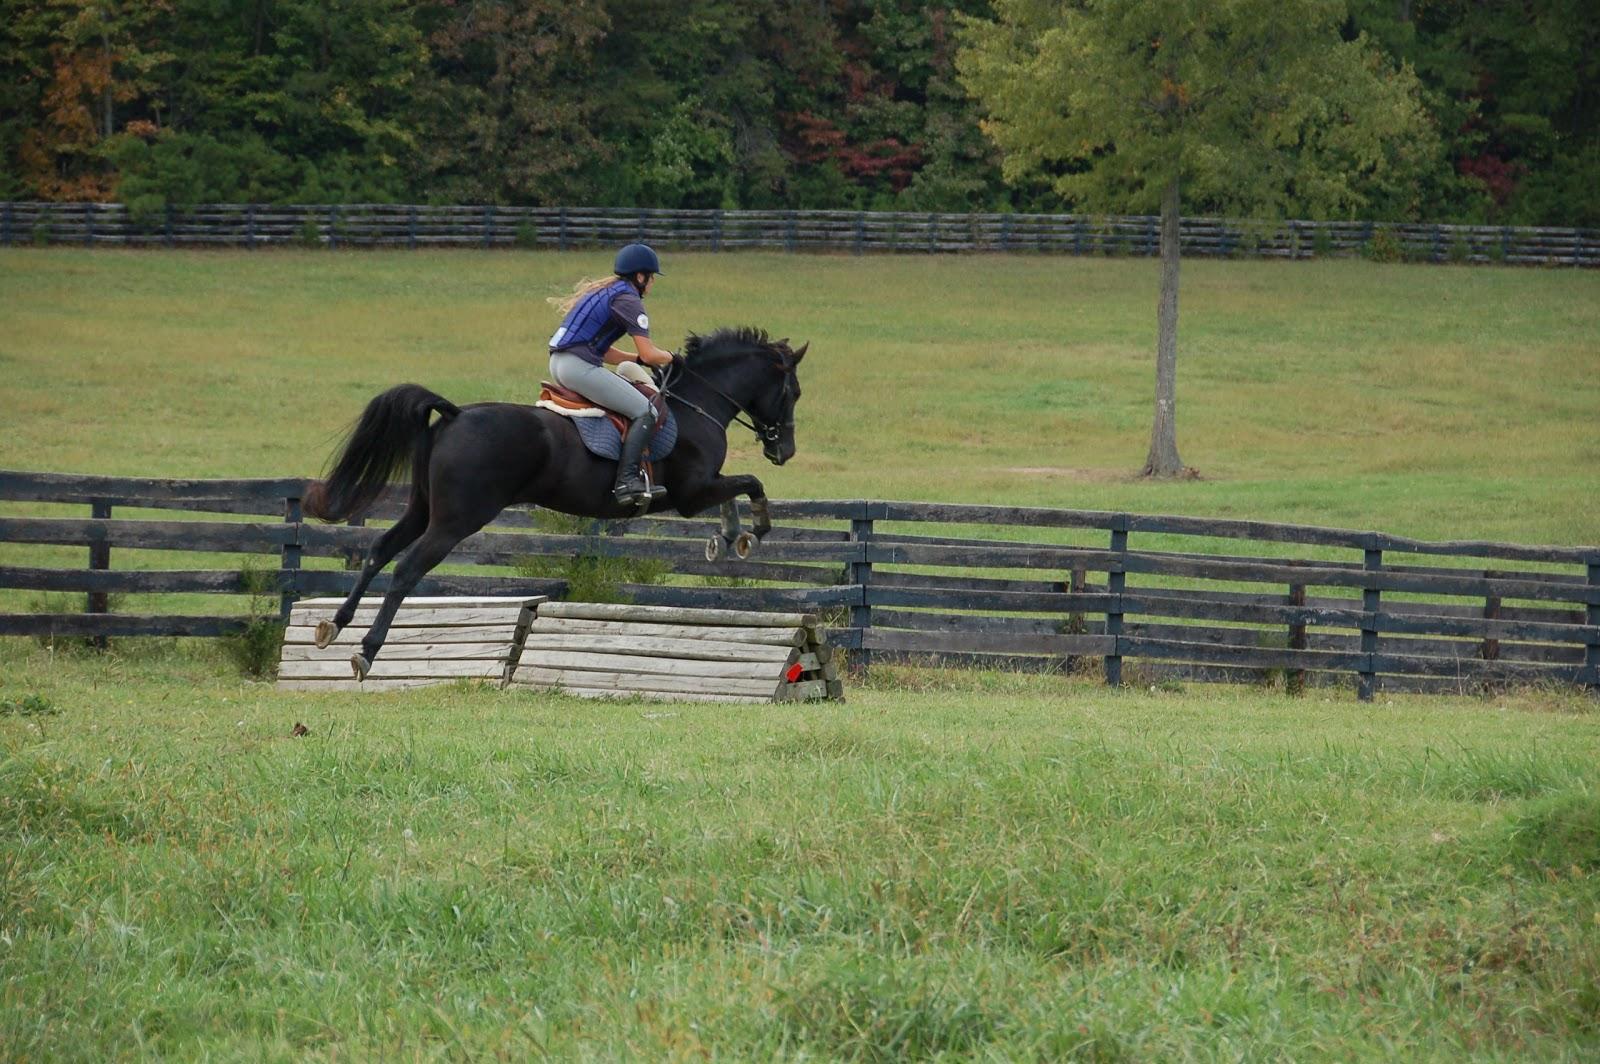 Black horses jumping - photo#14